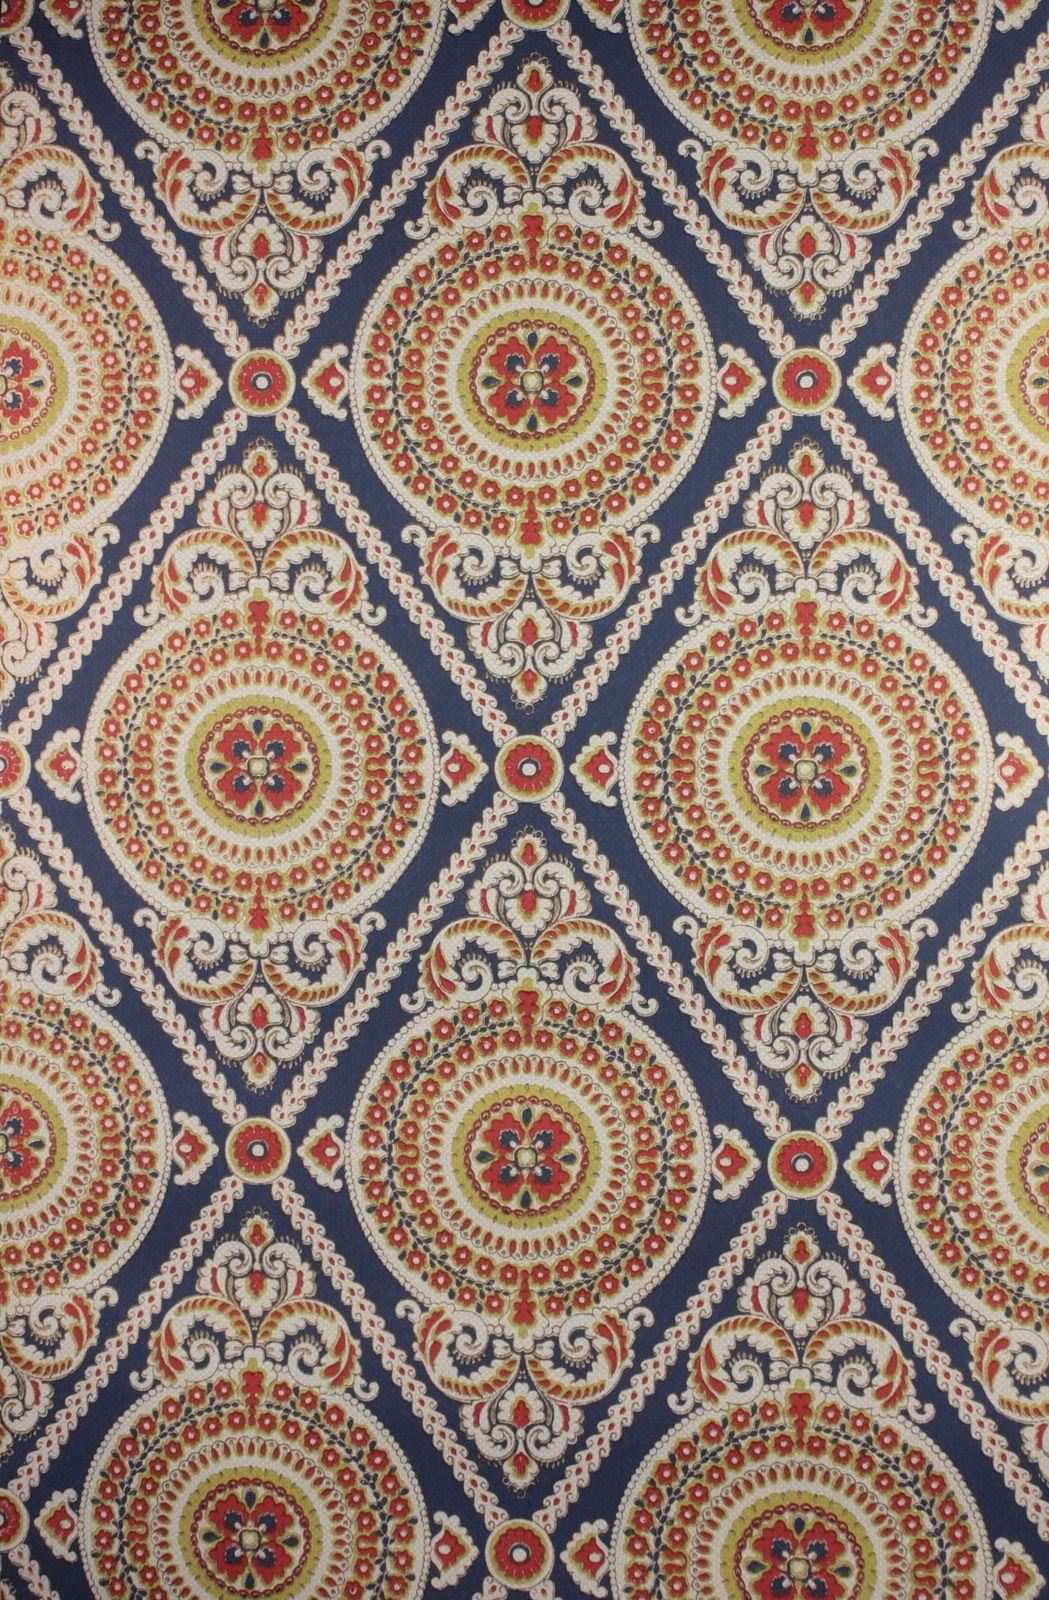 Blauw Rood Medaillon Behang Swiet Pattern Design